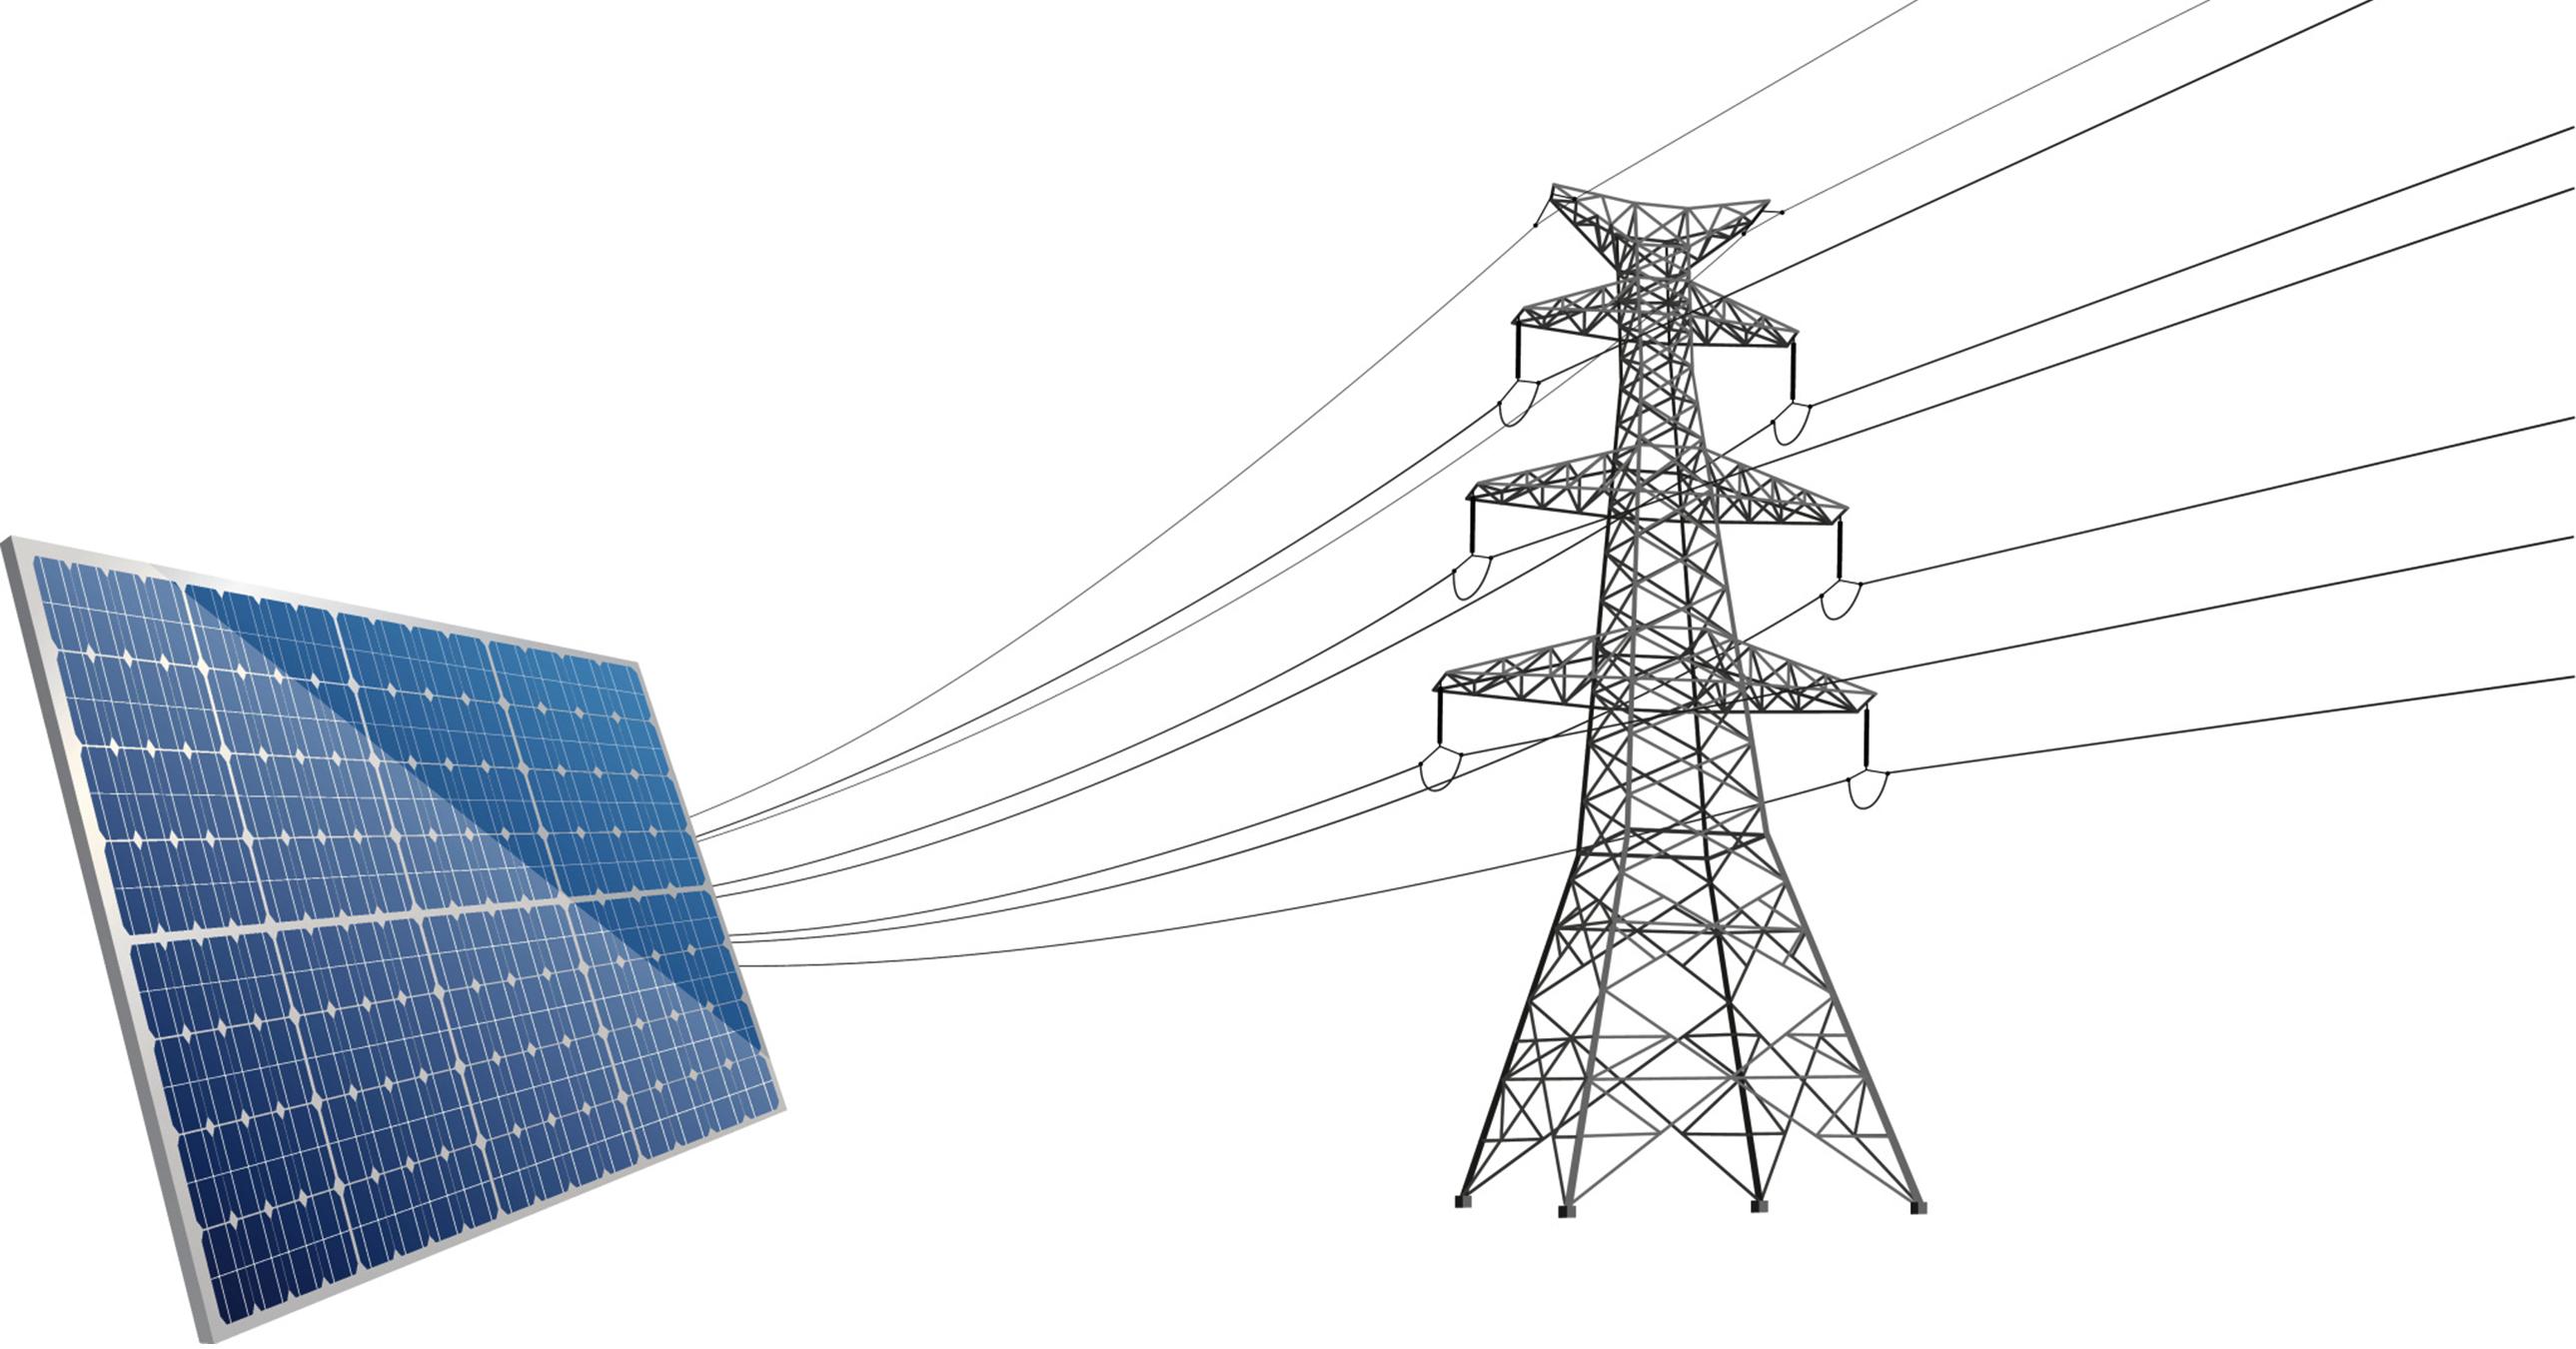 kisspng-transmission-tower-clip-art-solar-energy-generation-5a7a0031ef2de8.7644022615179448819797